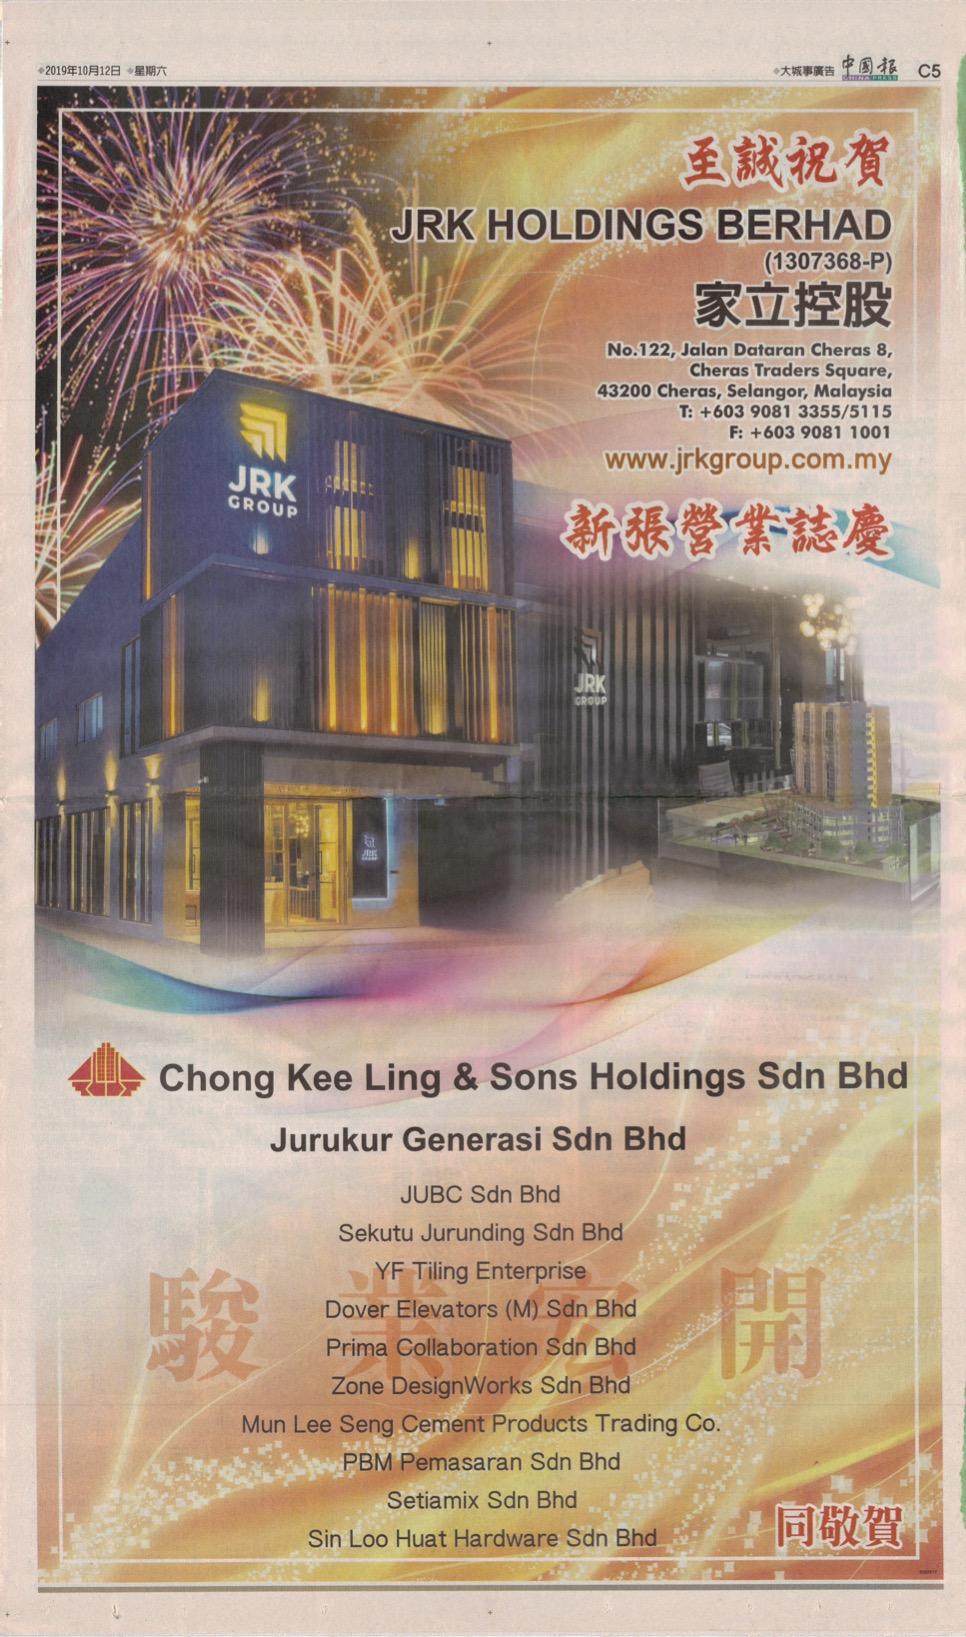 JRK HQ Launch Congratulatory Ads